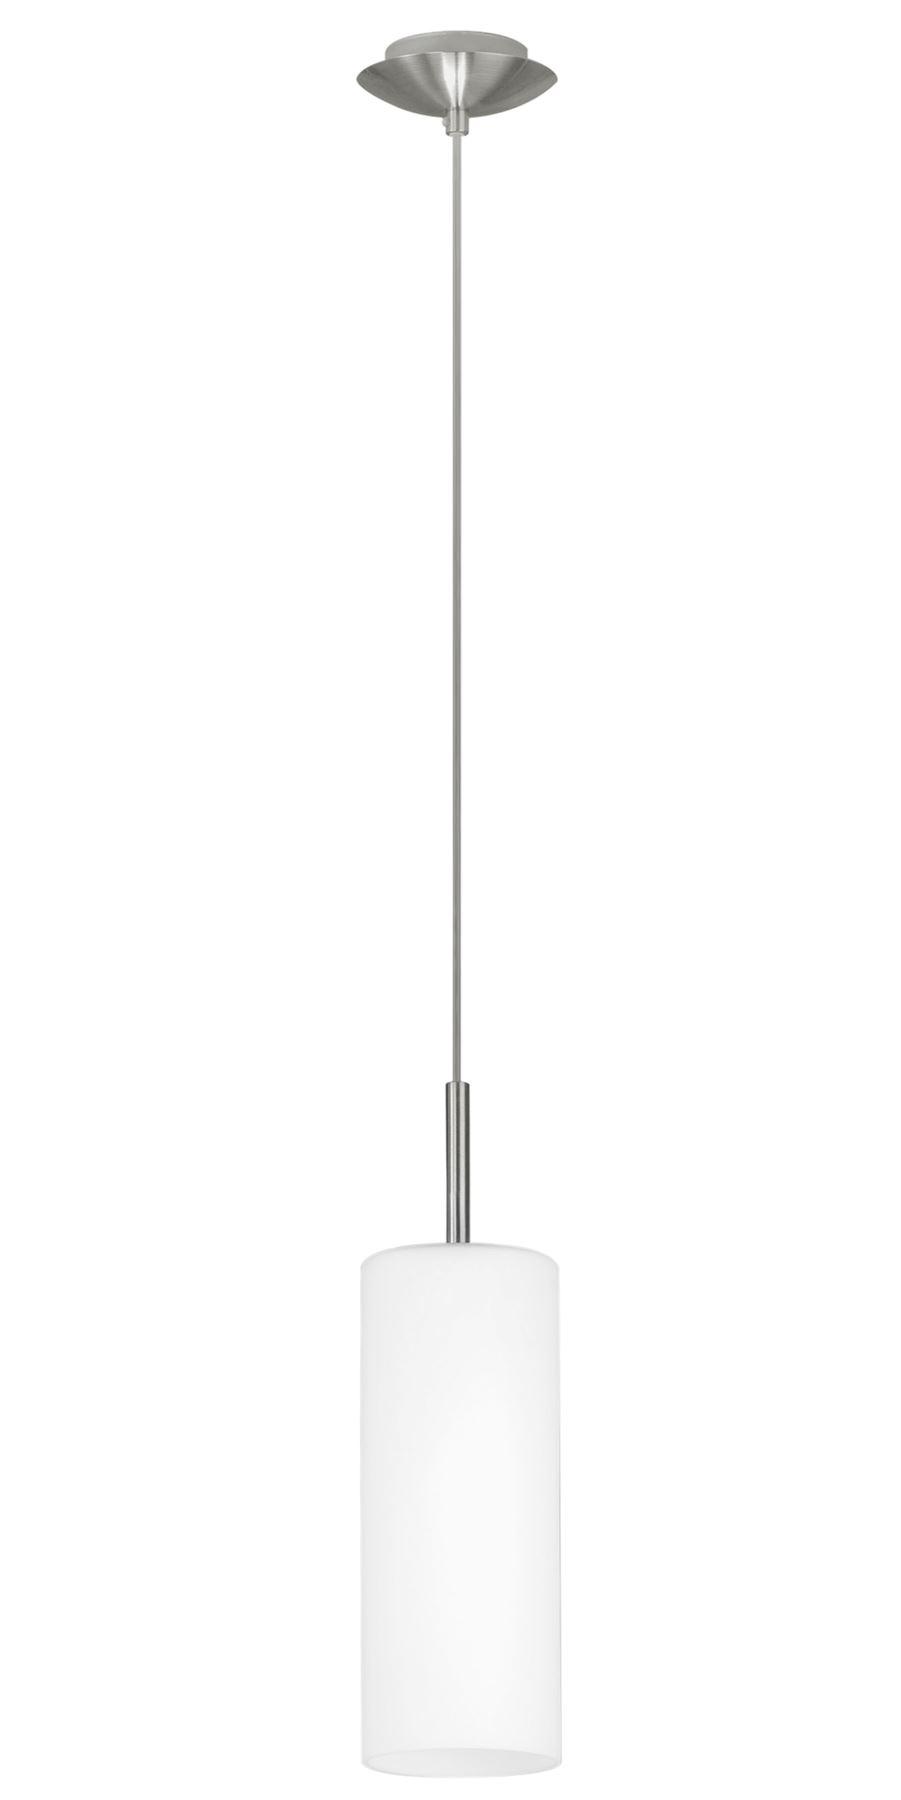 Troy Steel Hanging 1 Light Nickel-Matt White Coated Glass Shade